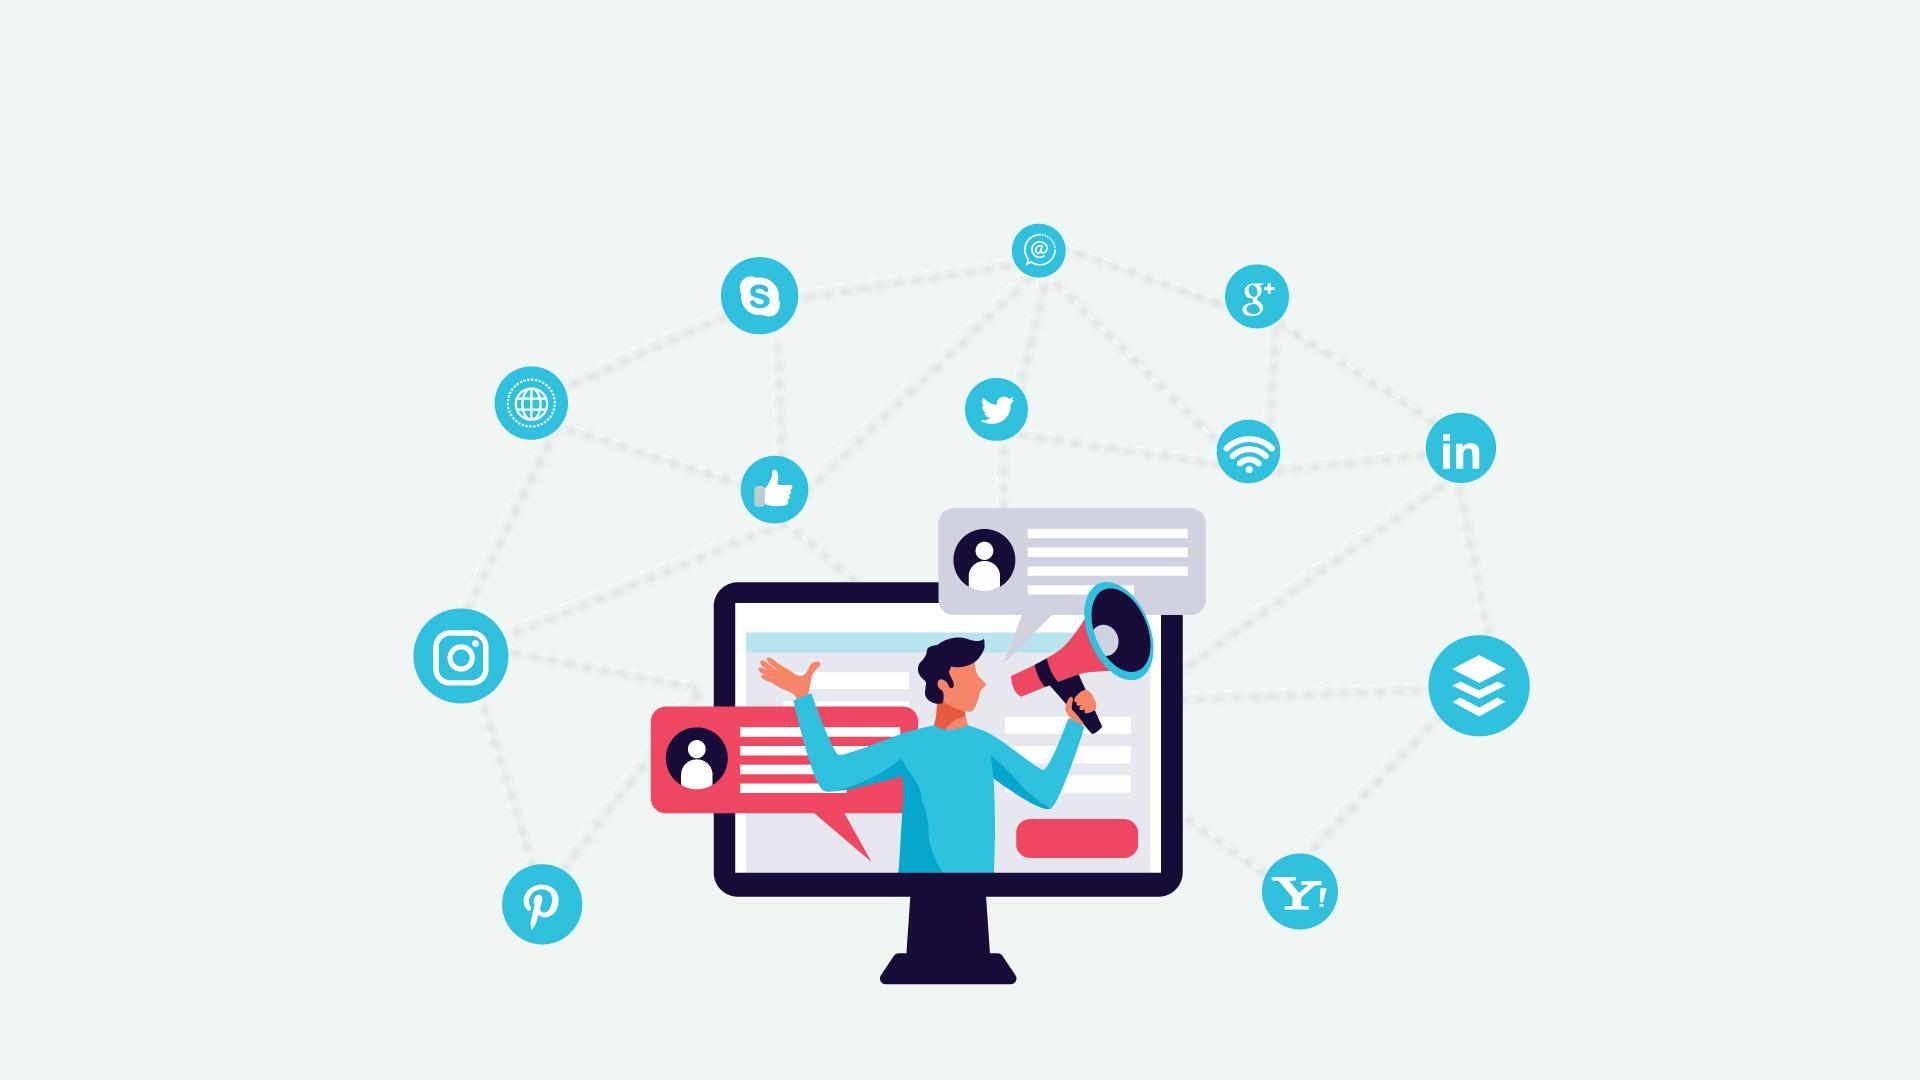 Smm2 digital marketing ideas